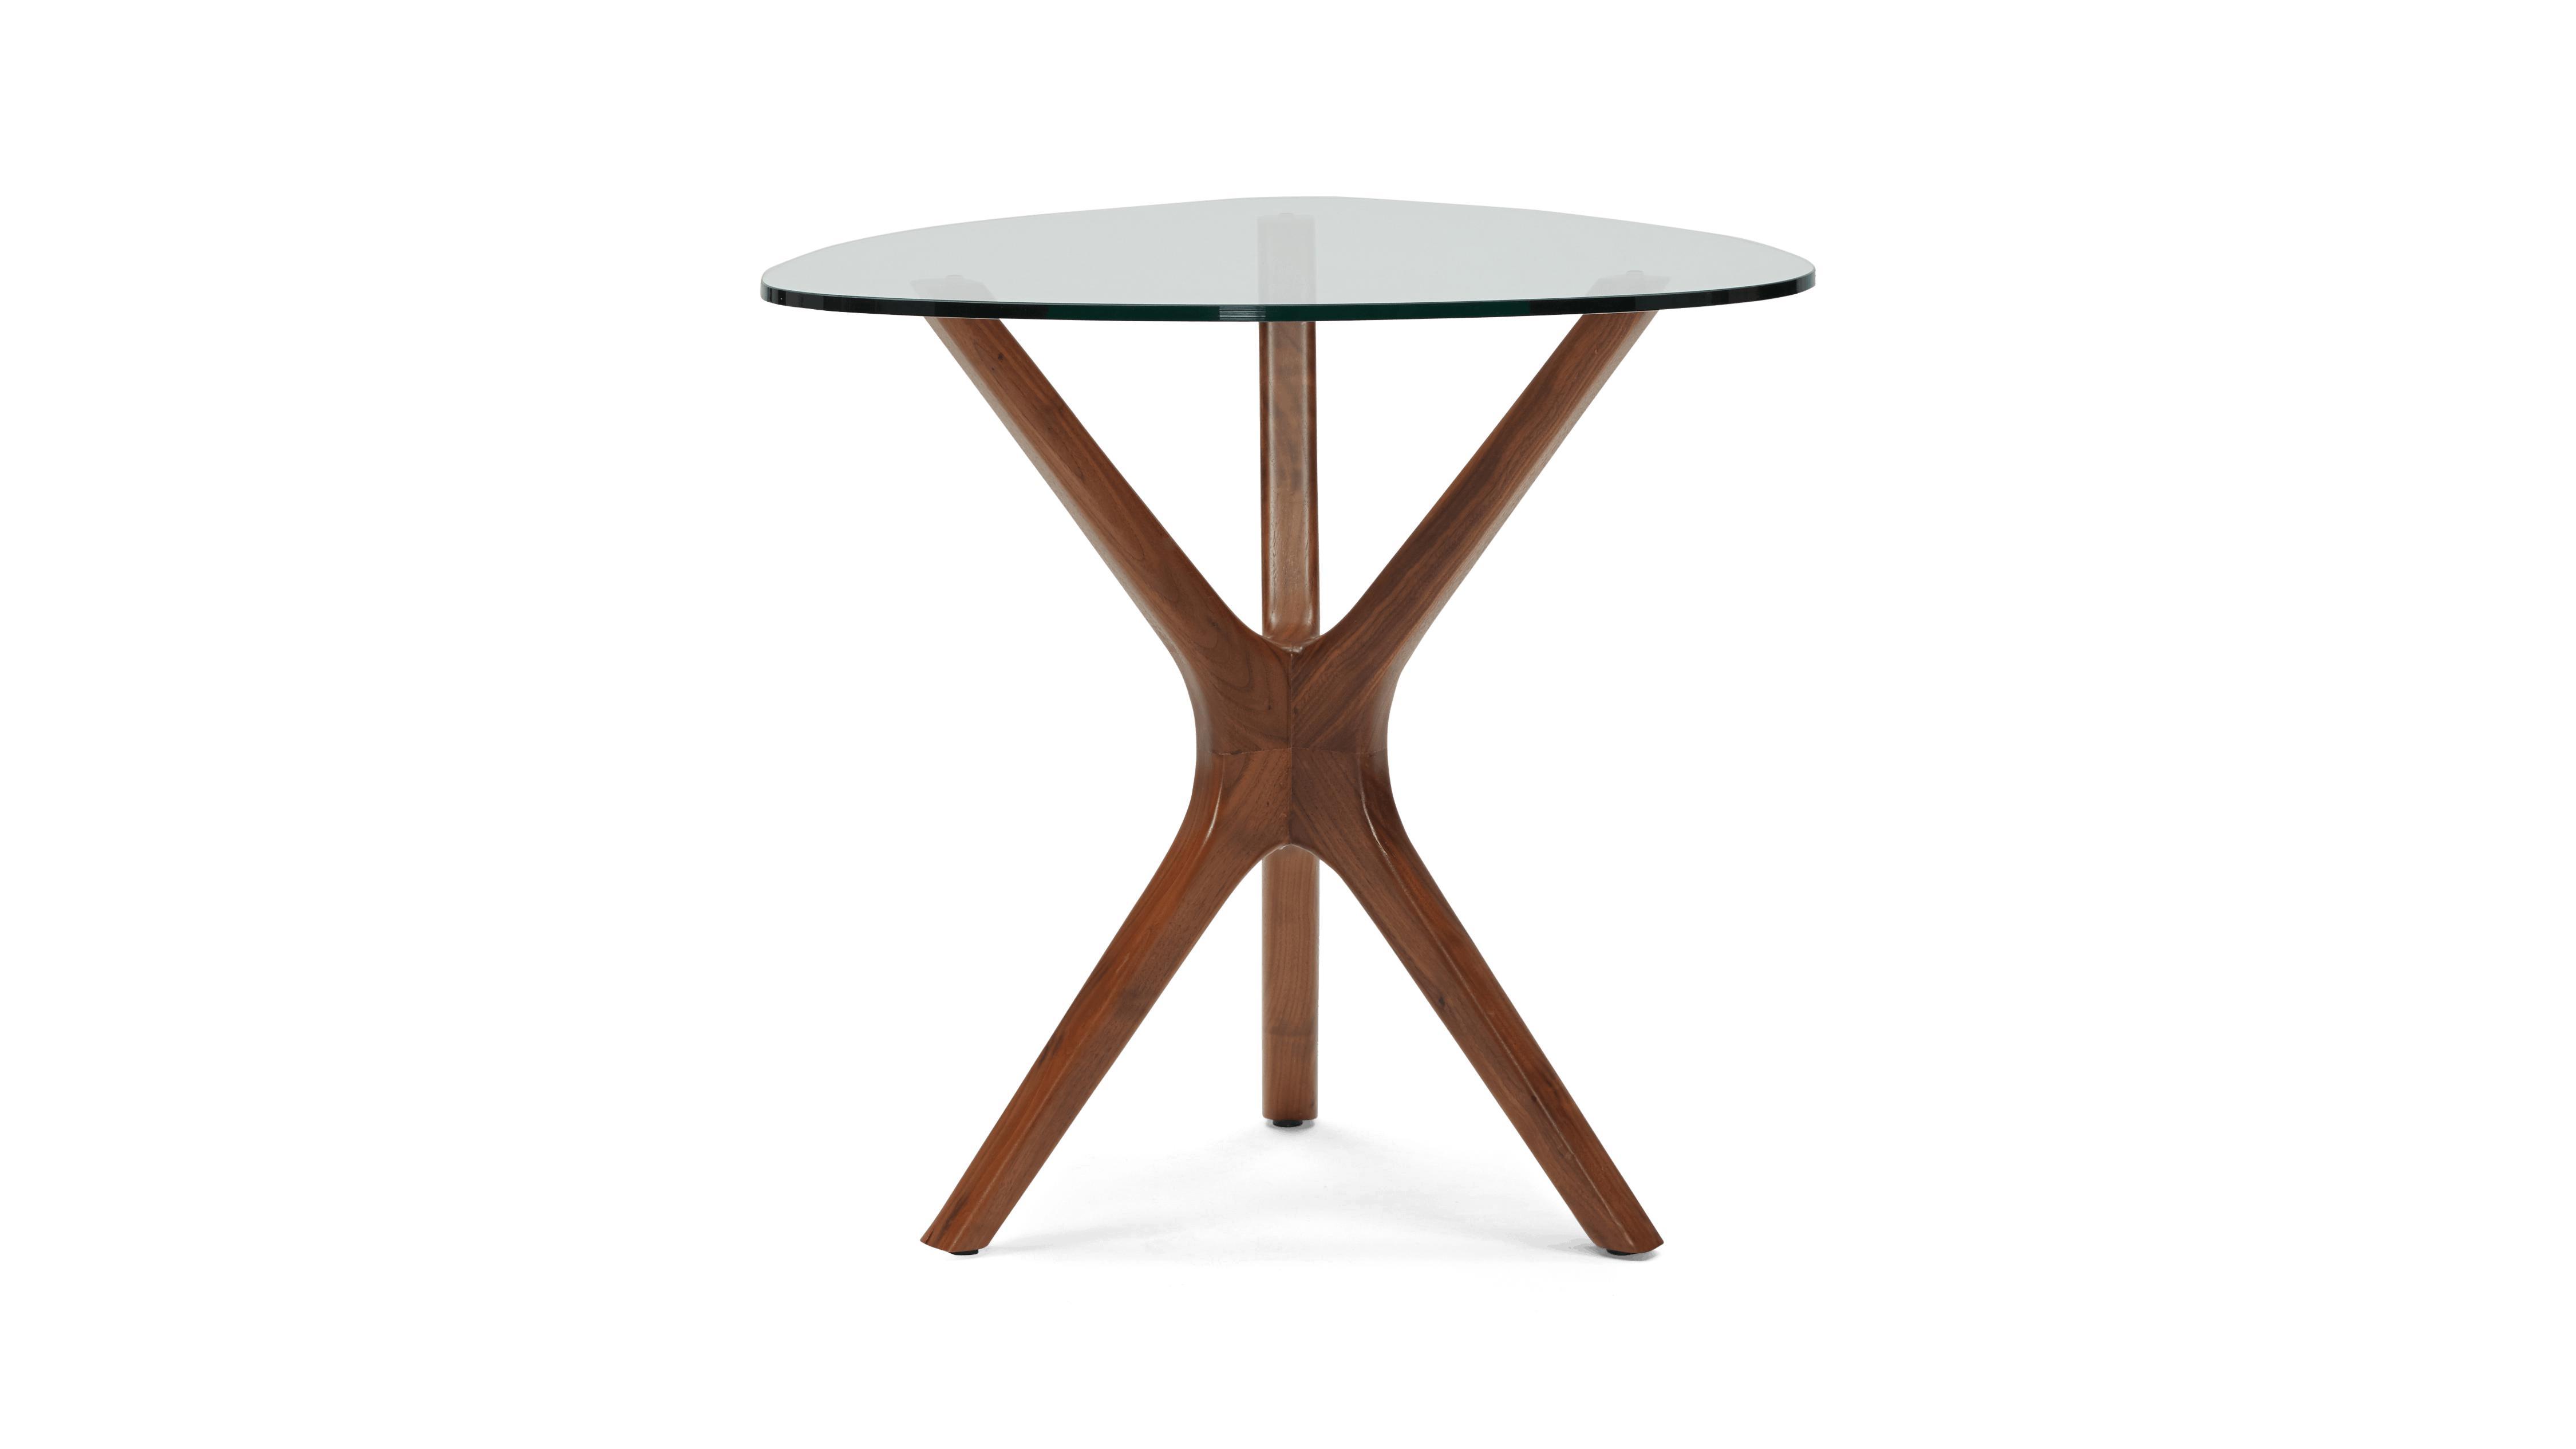 Tolson Mid Century Modern End Table - Walnut